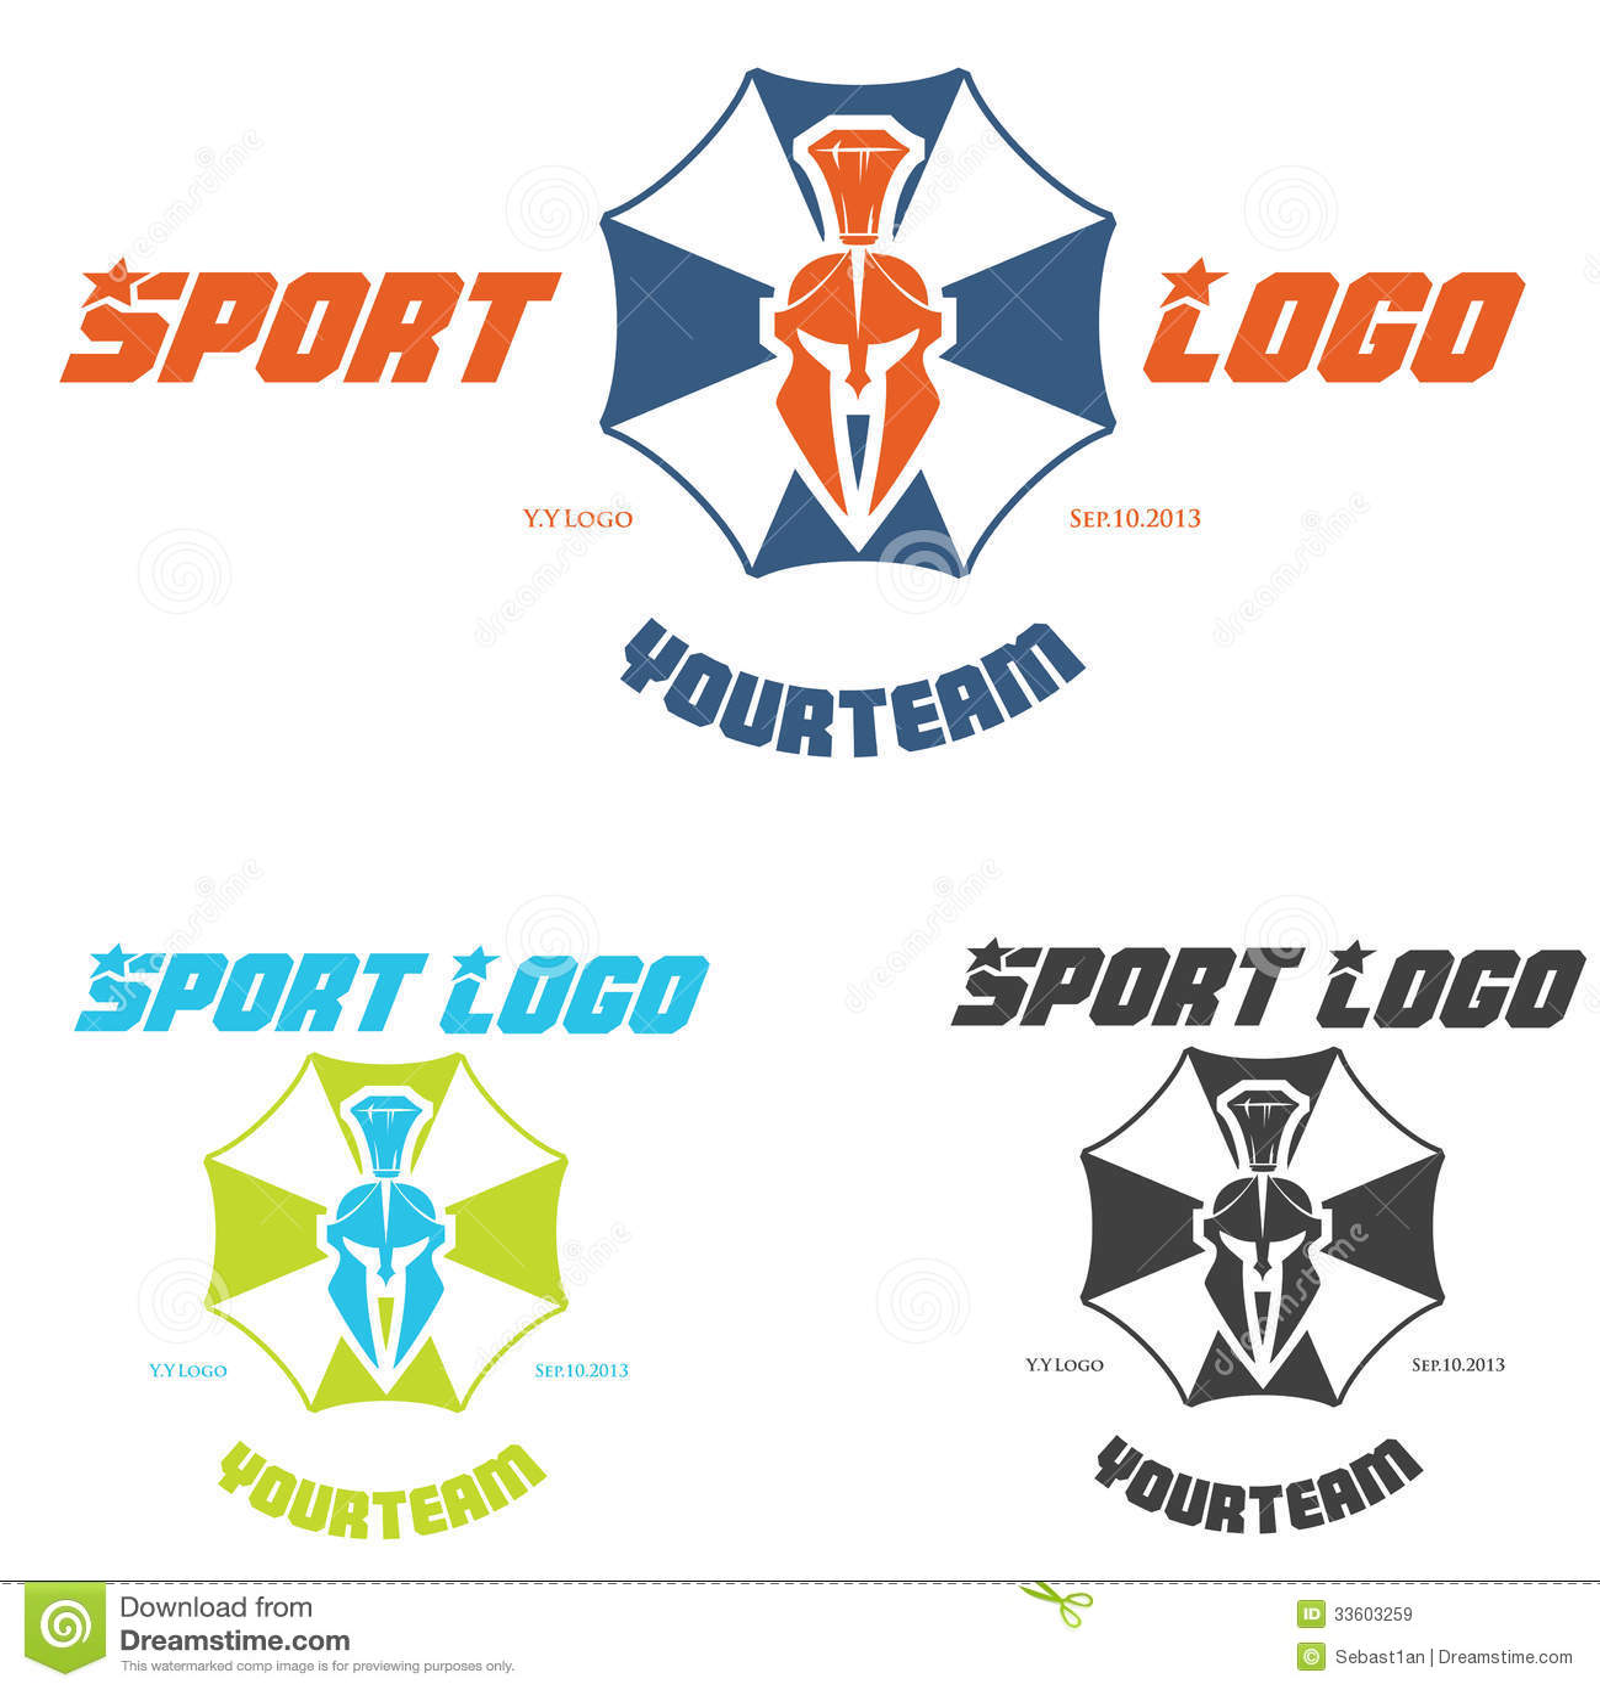 sports logo royalty free stock images image 33603259